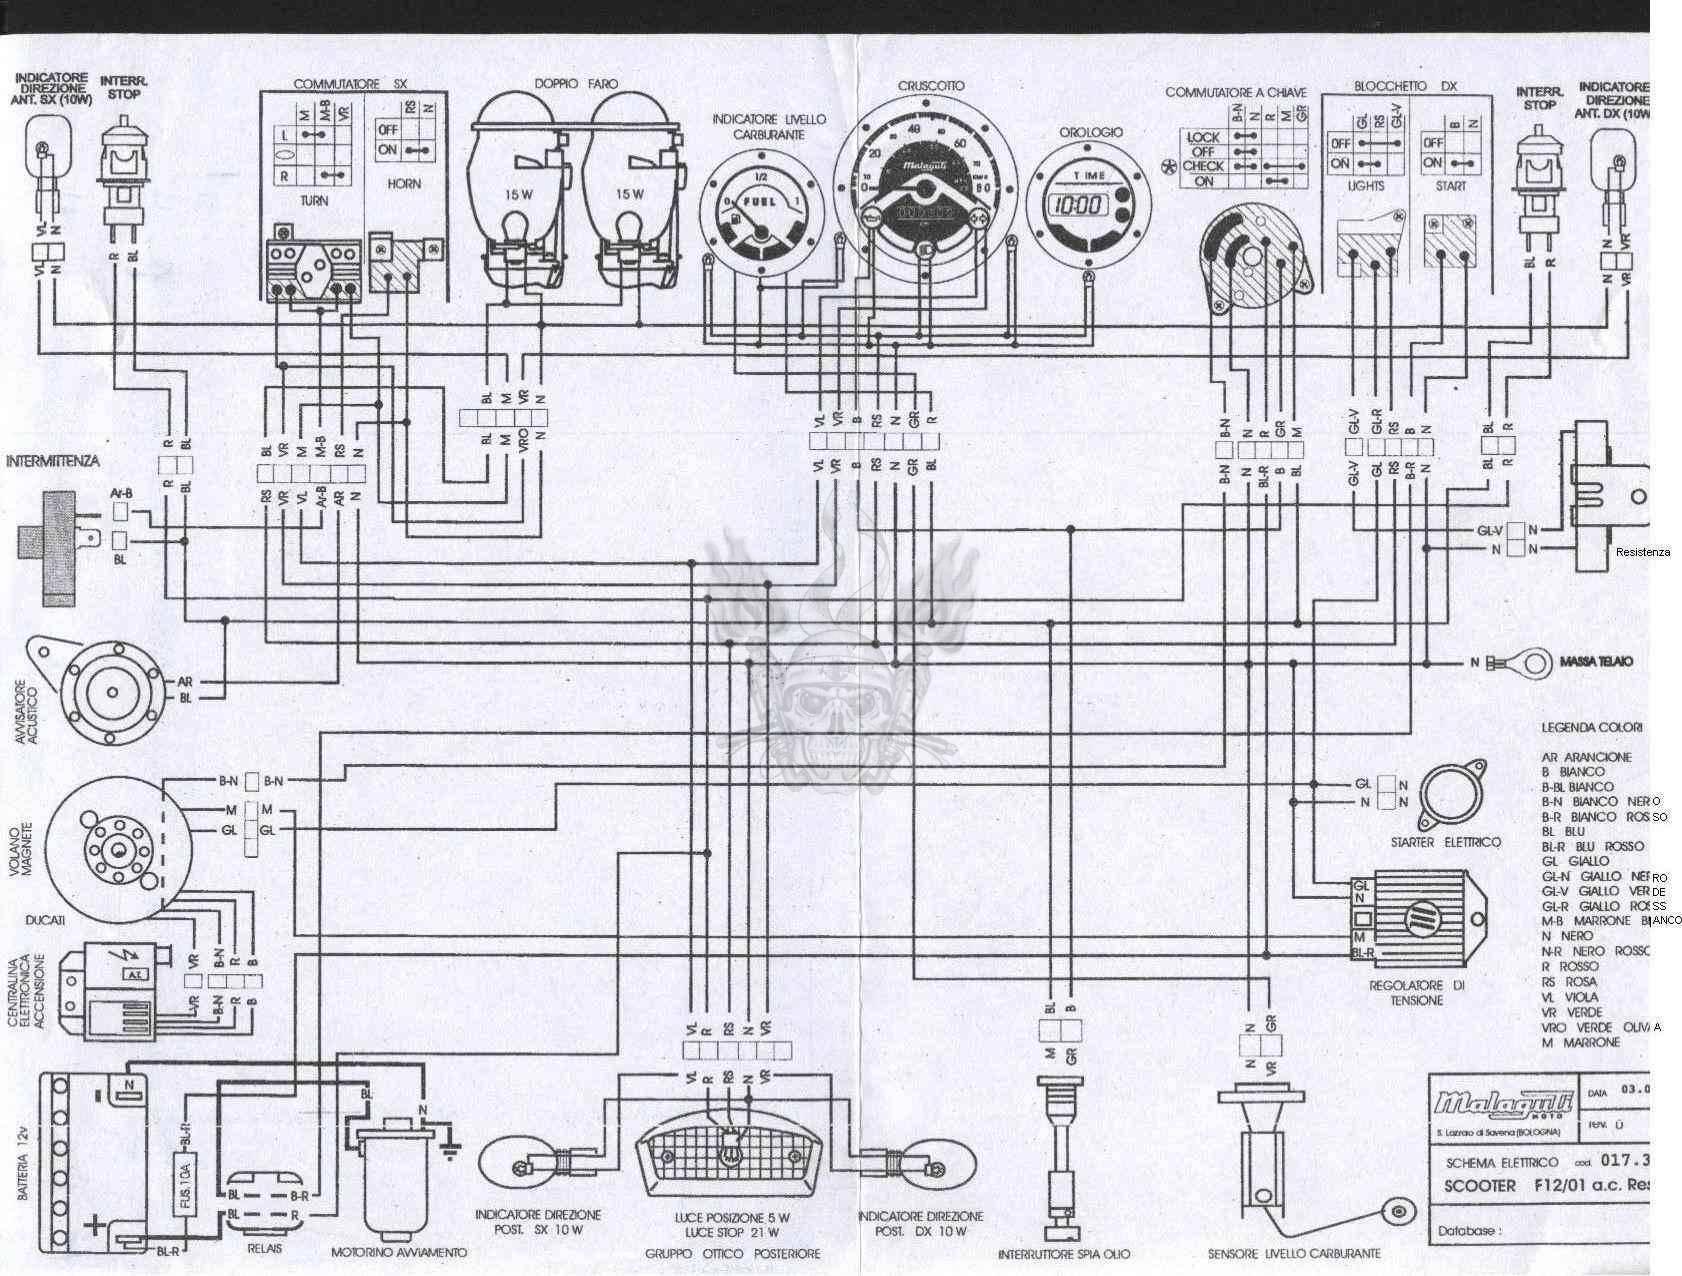 ajs wiring diagram lighting diagrams sincgars radio configurations rh banyan palace com ajs regal raptor wiring diagram ajs regal raptor wiring diagram